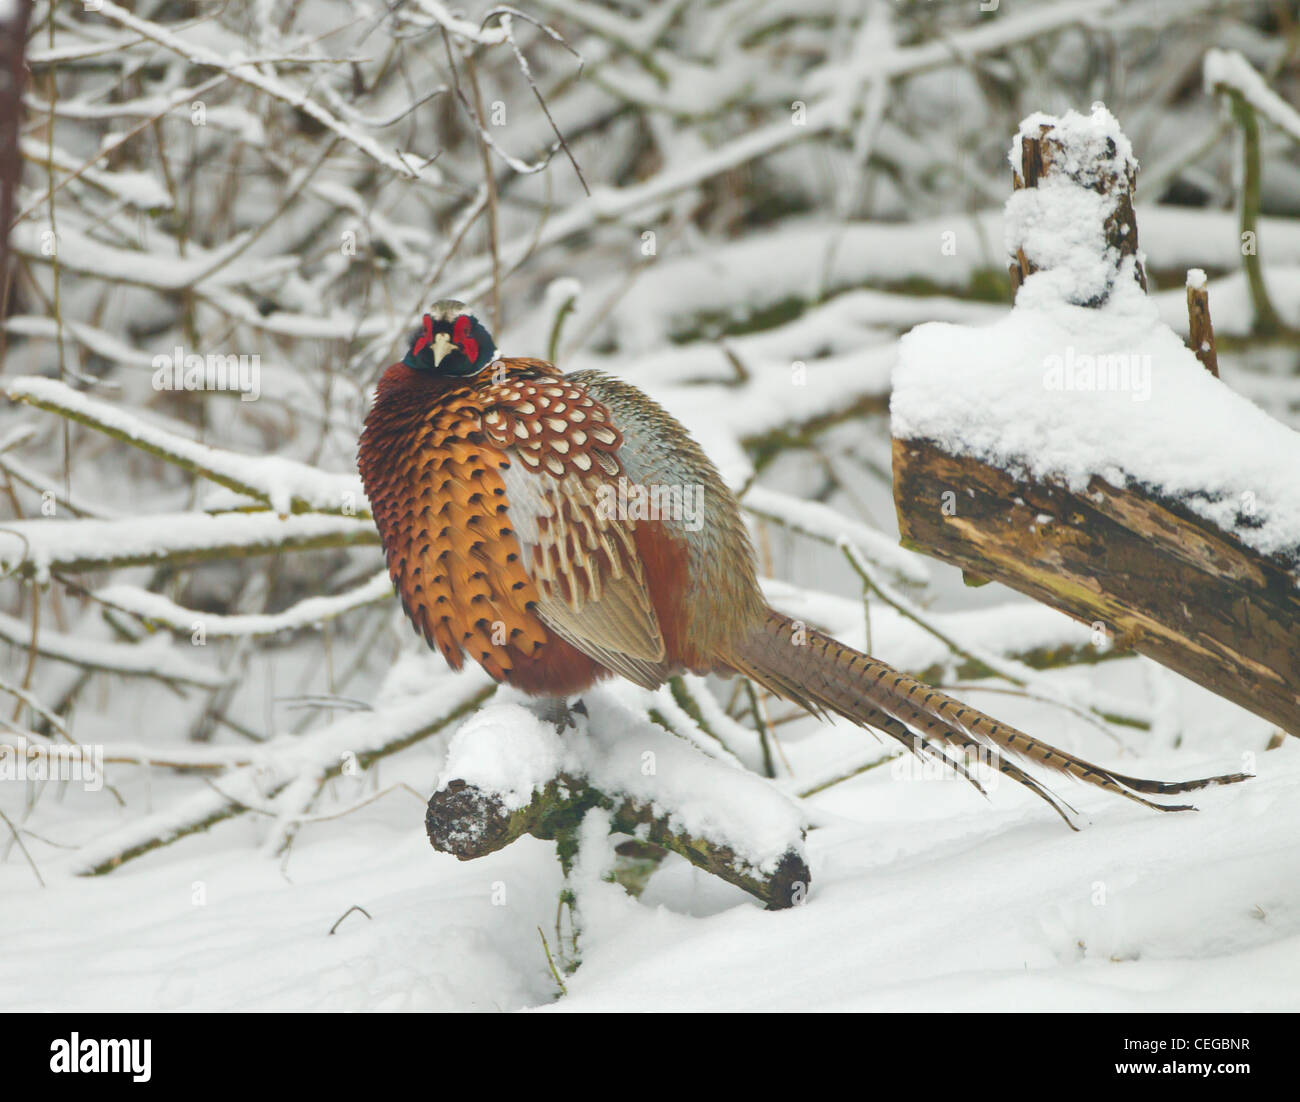 Pheasant In Snow Stock Photos & Pheasant In Snow Stock Images - Alamy